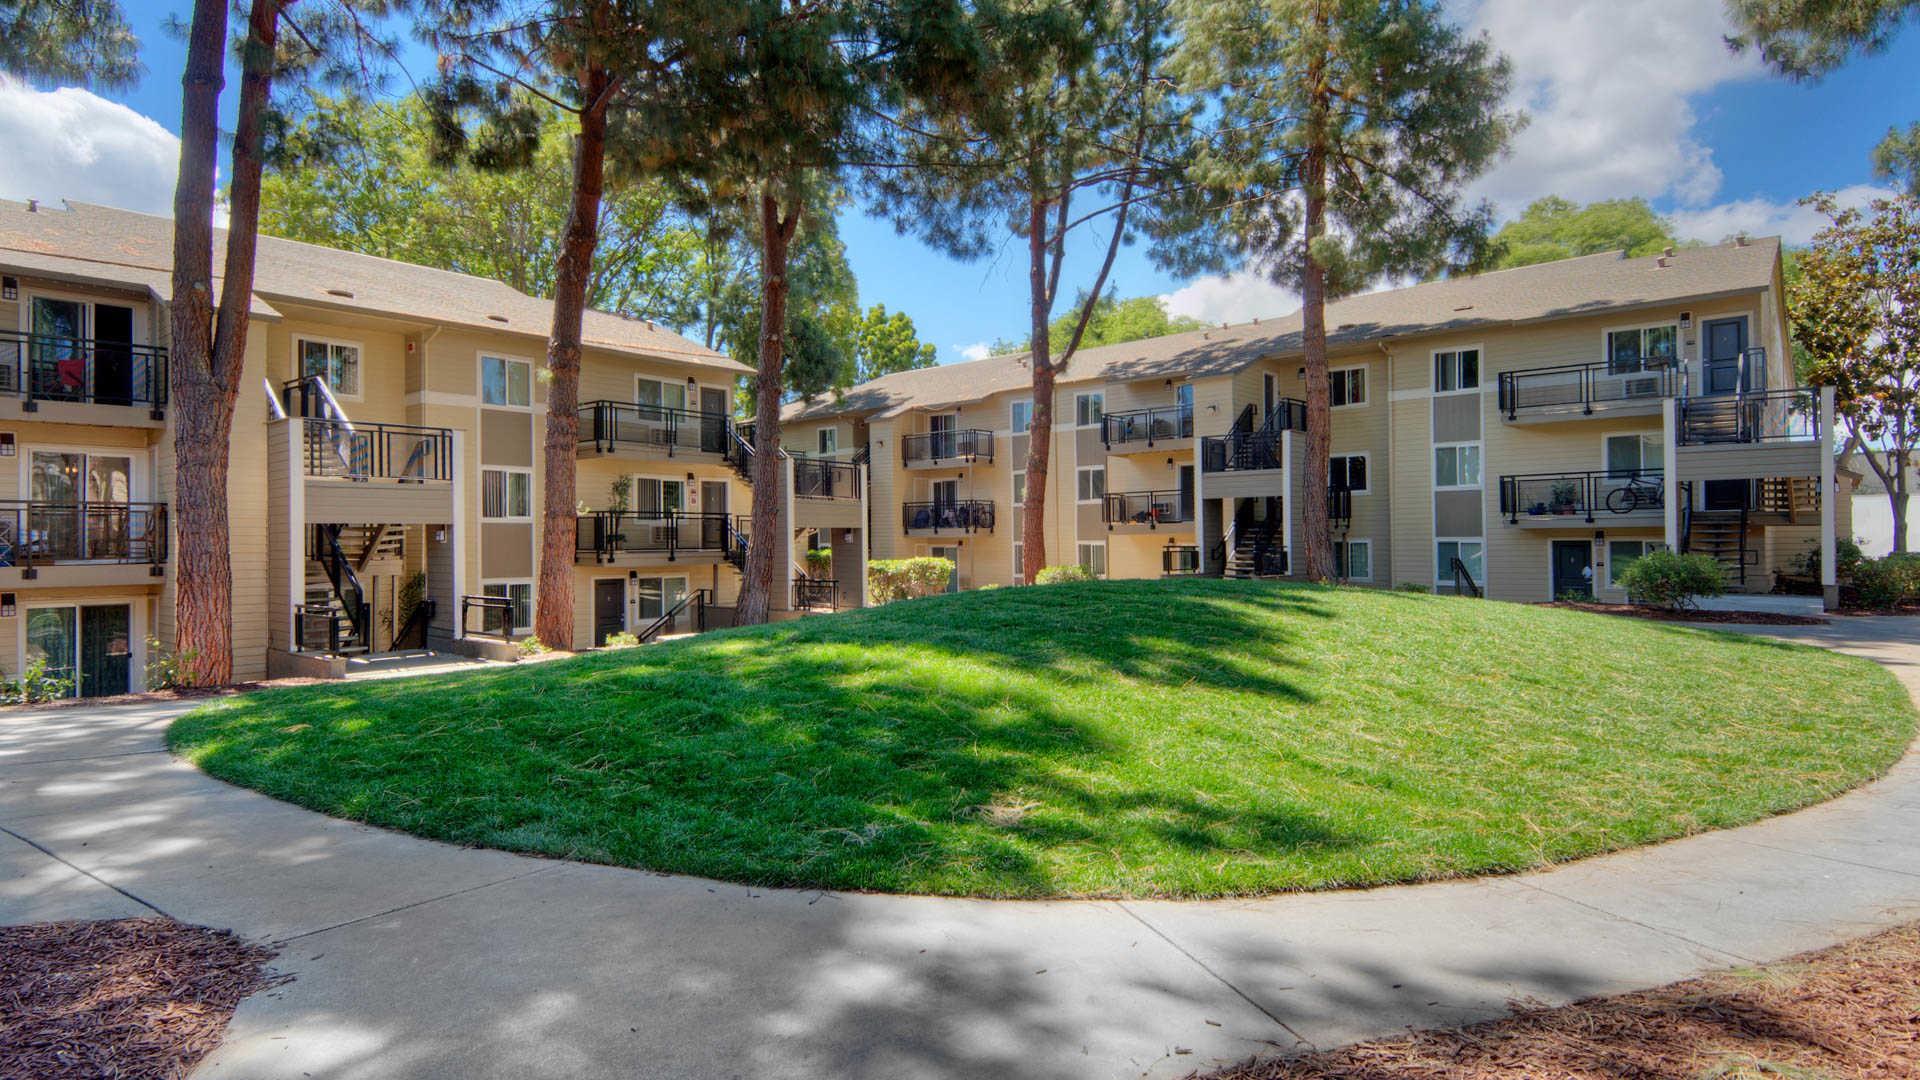 Arbor Terrace for rent